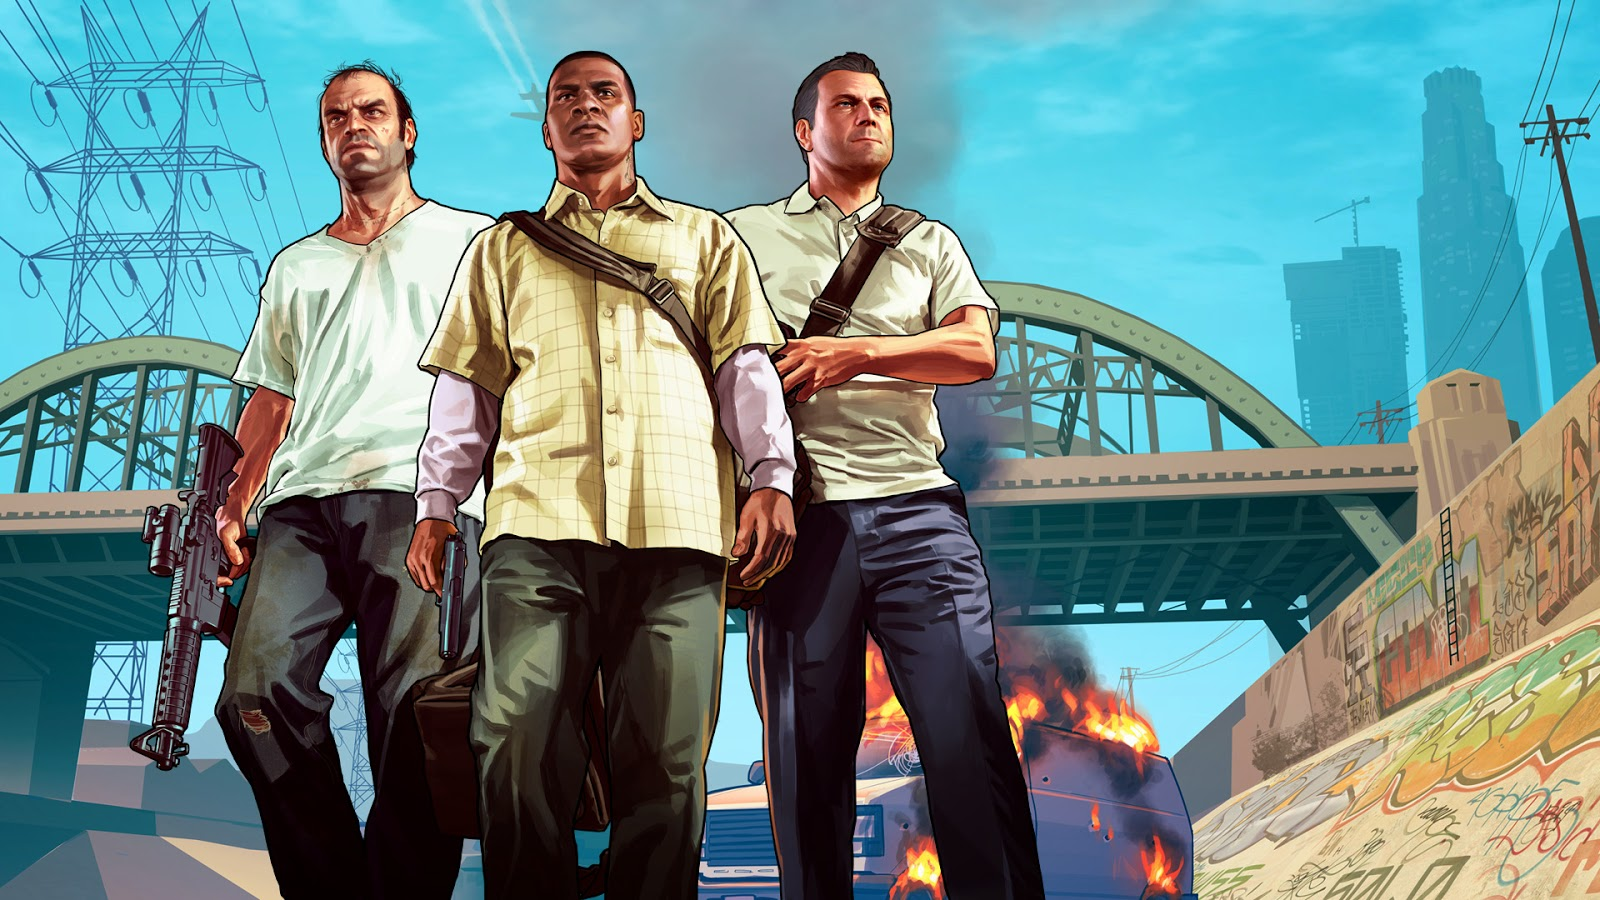 Grand Theft Auto V Franklin Michael & Trevor HD desktop  - michael franklin trevor in gta wallpapers